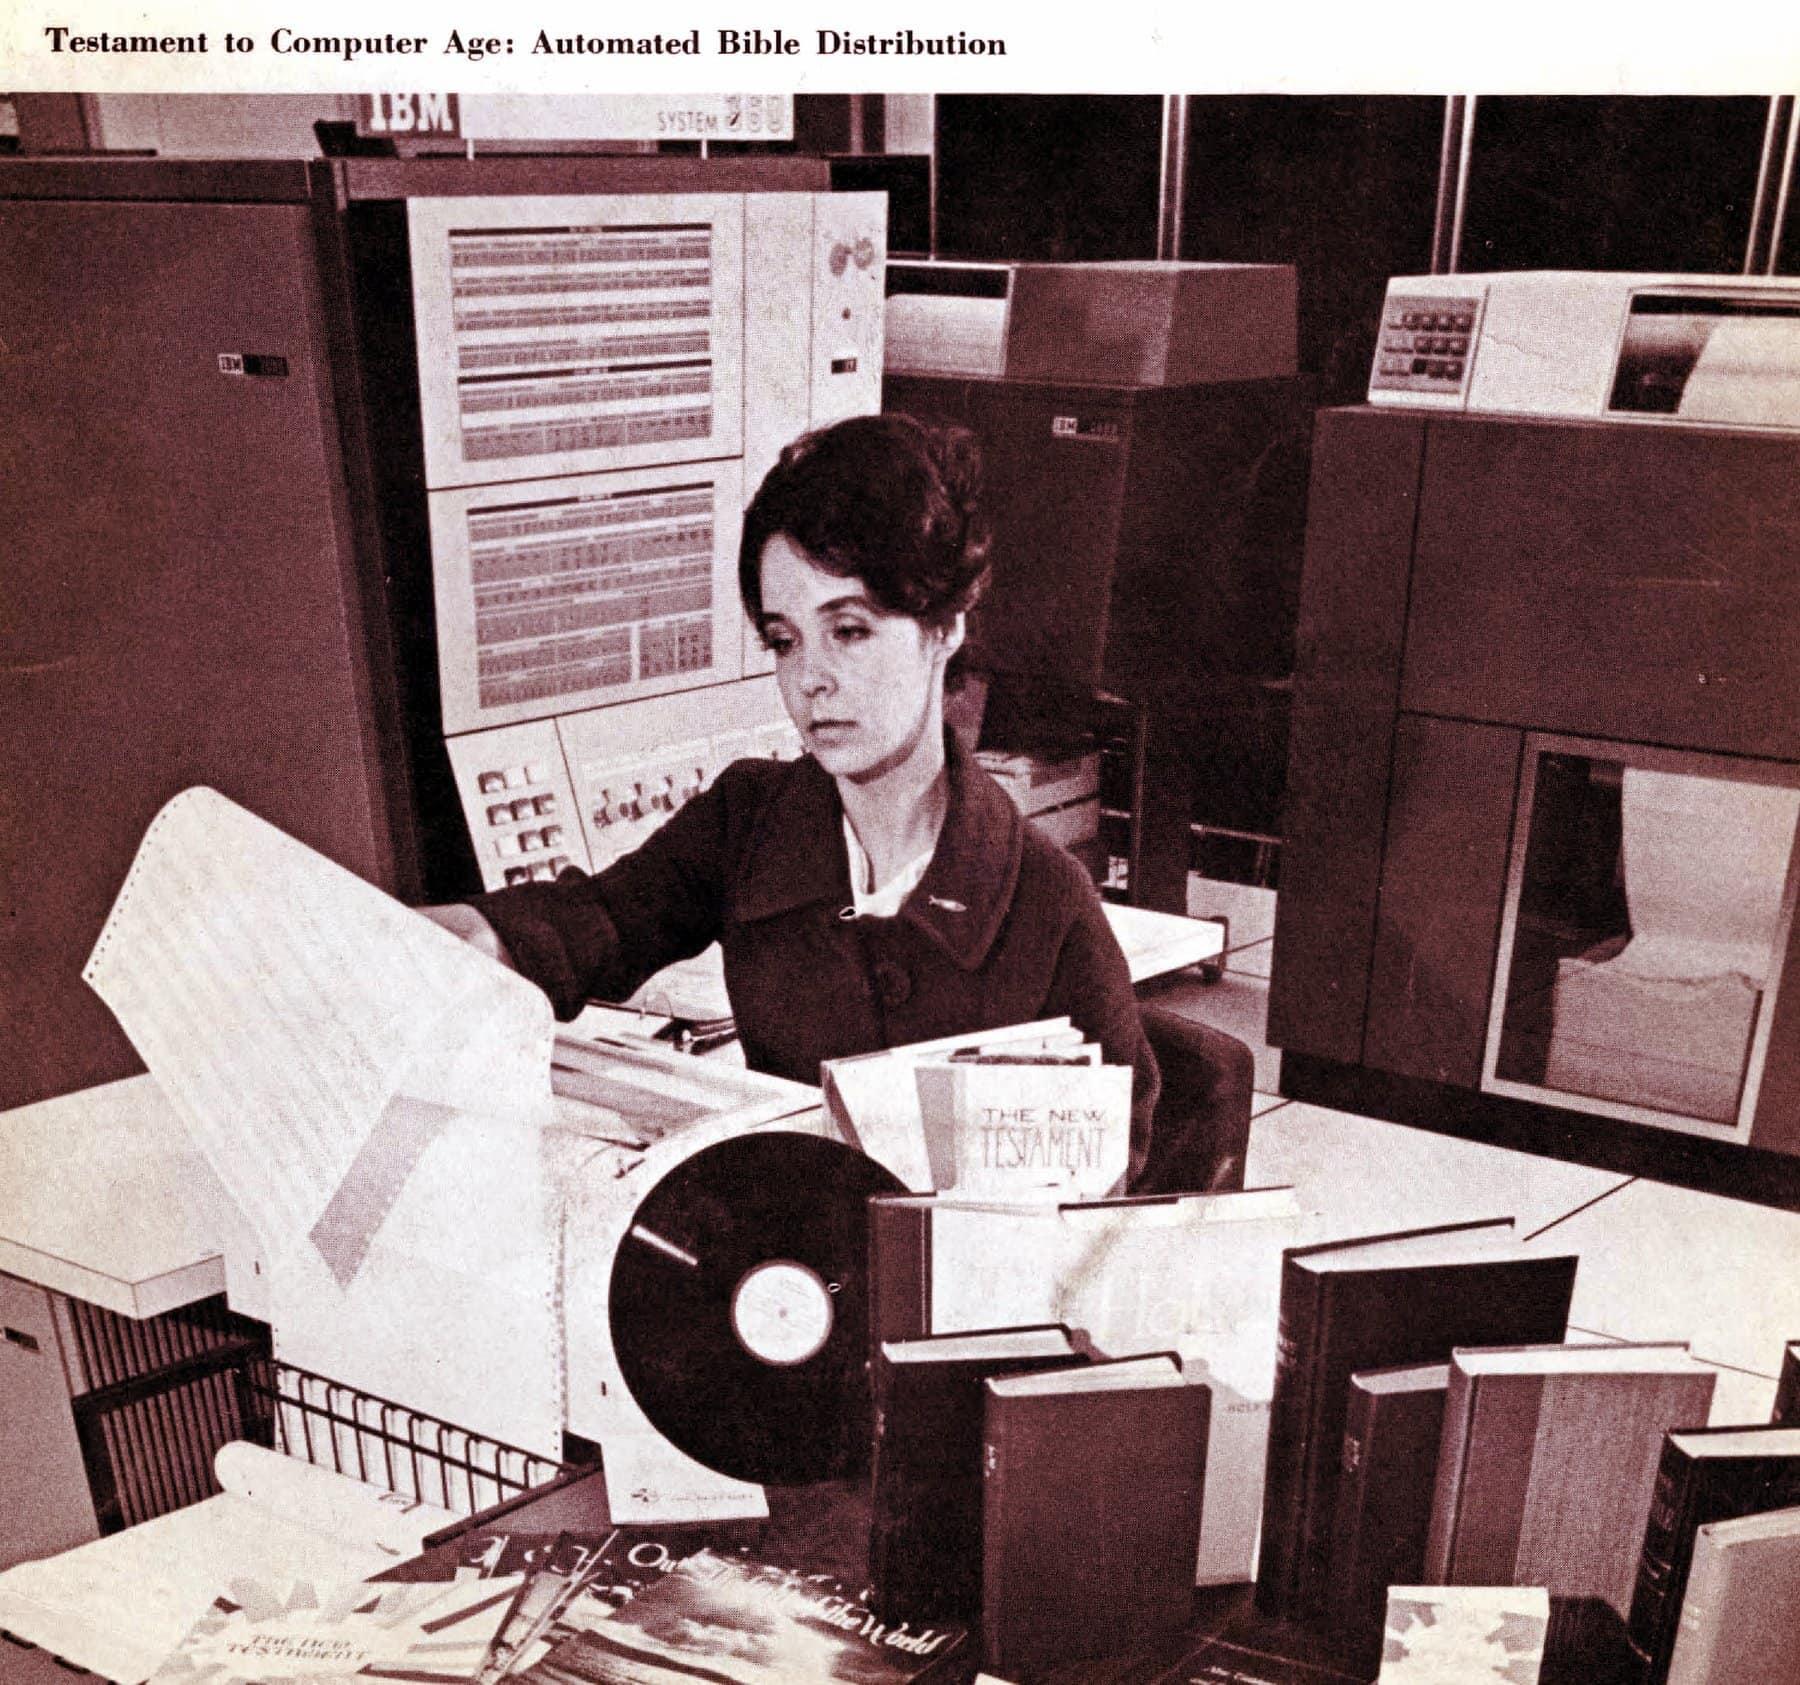 Computer-automated bible distribution (1967)